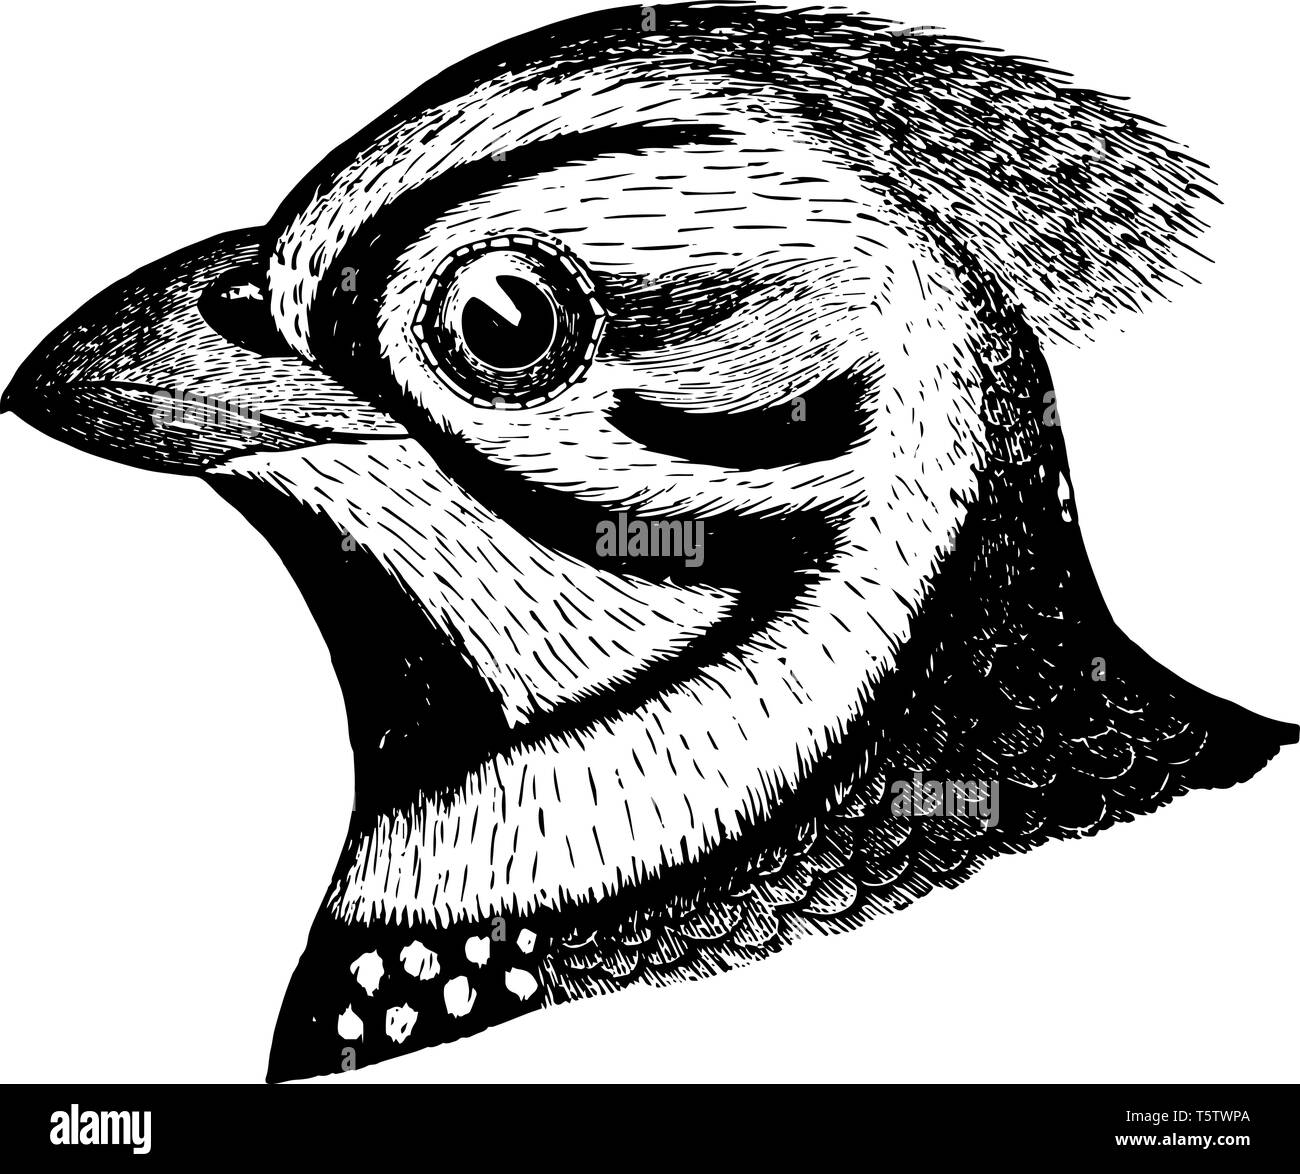 Quail Black and White Stock Photos & Images - Alamy